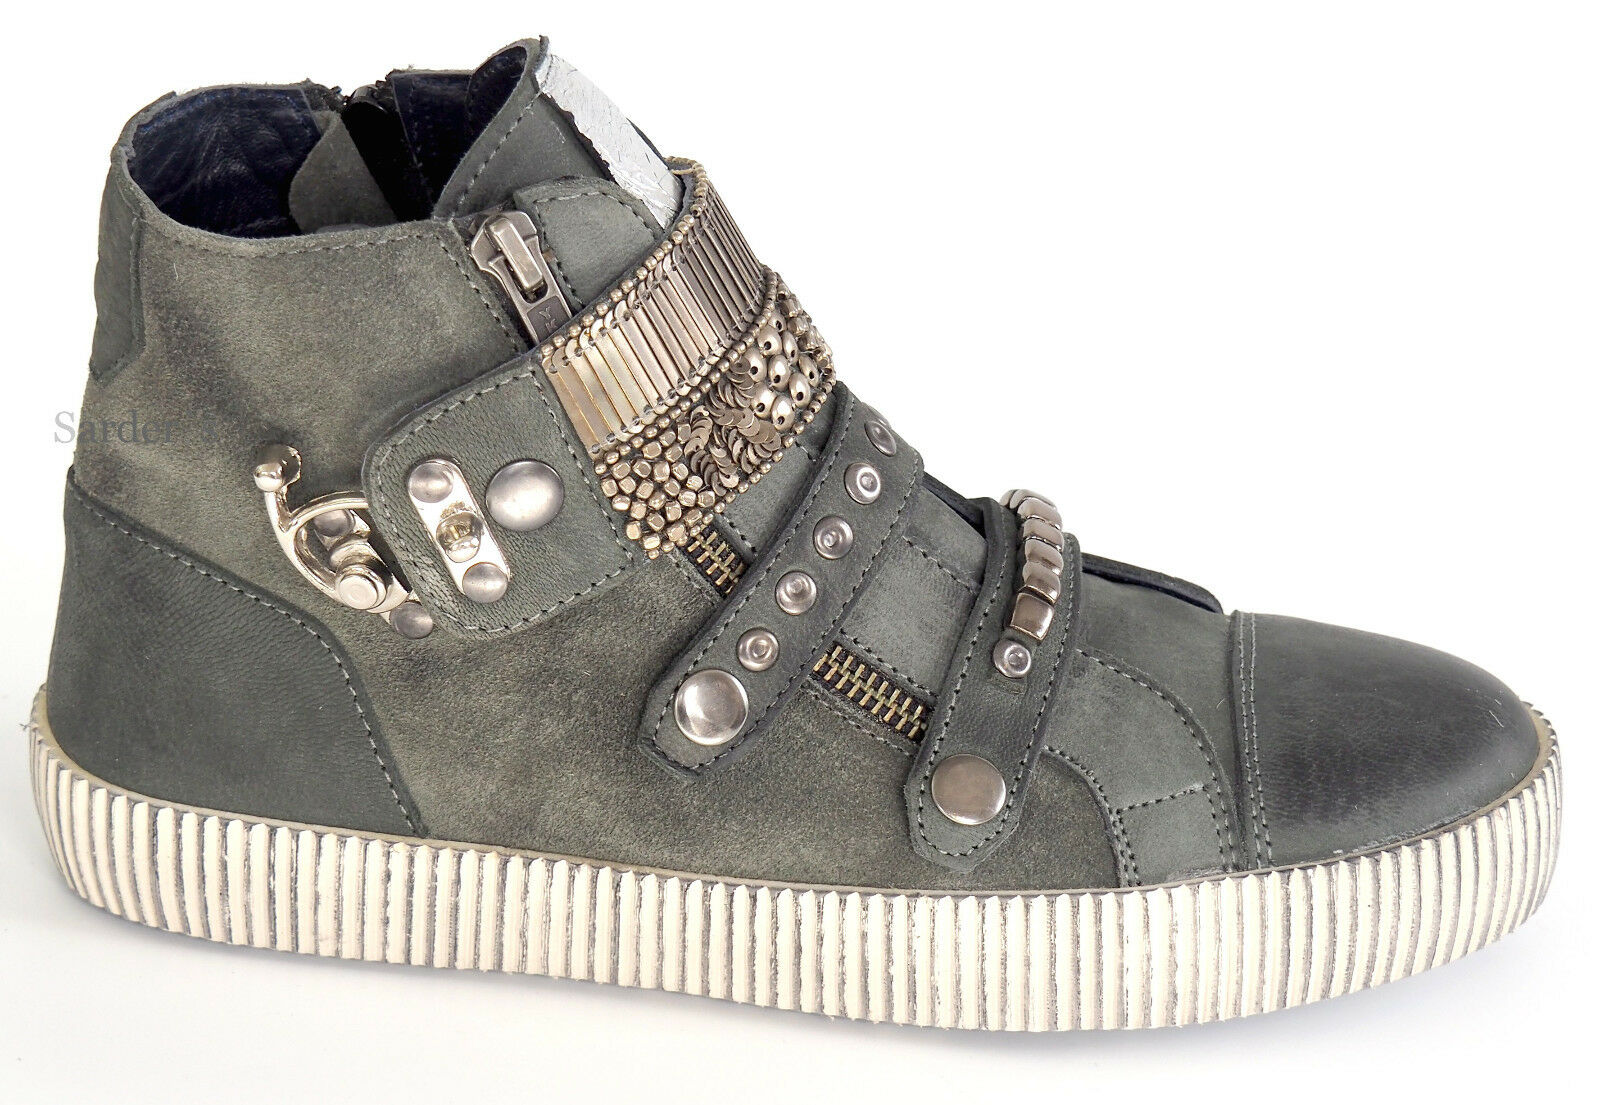 XYXYX Sneaker 37 Nubuk Used Velours LEDER Grau Silber Used Nubuk Stiefel Stiefelette Sexy NEU f77ded